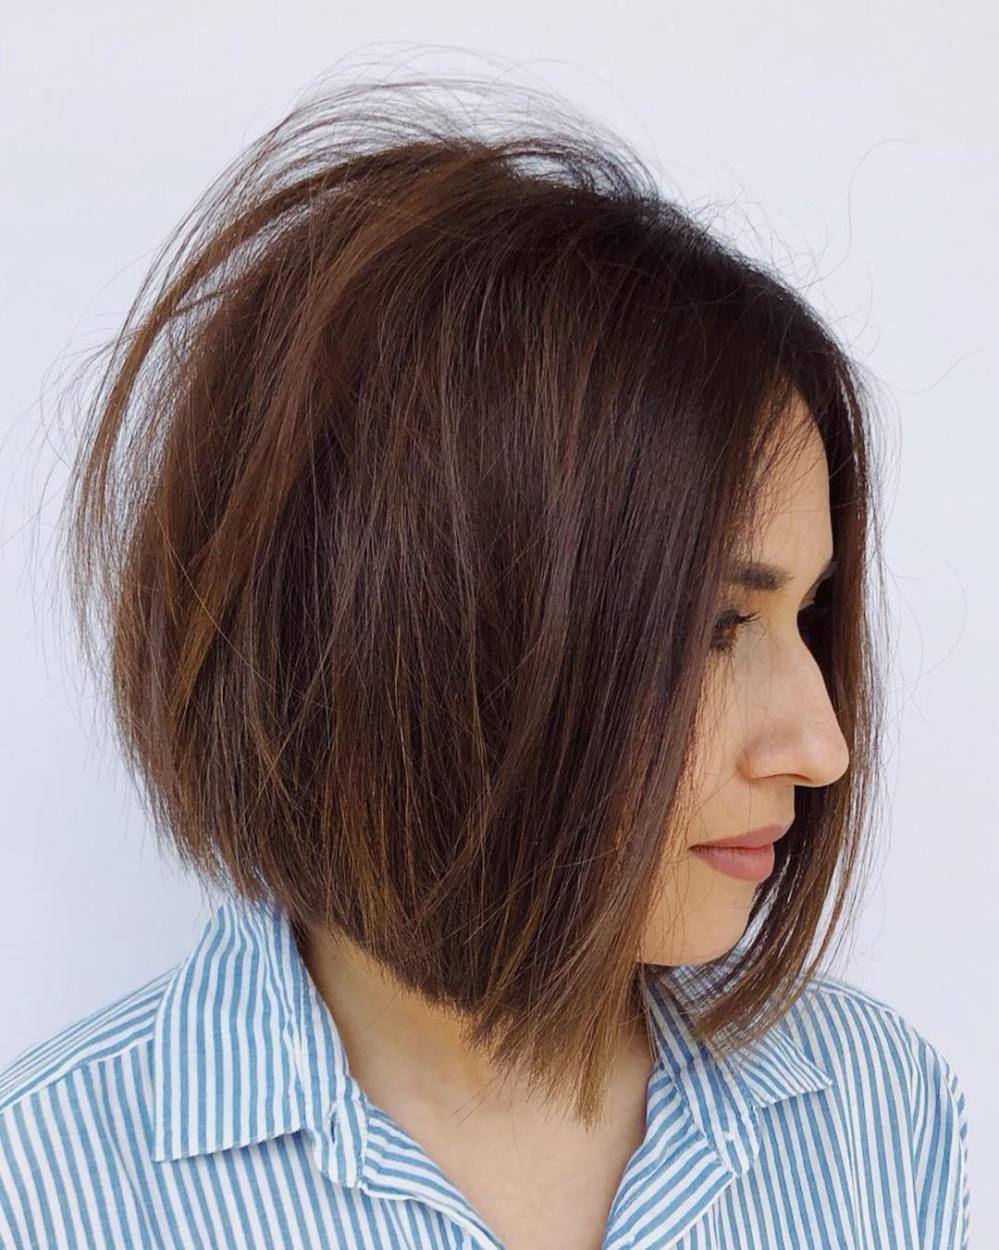 60 Best Short Bob Haircuts And Hairstyles For Women Brunette Bob Haircut Short Bob Haircuts Modern Bob Haircut